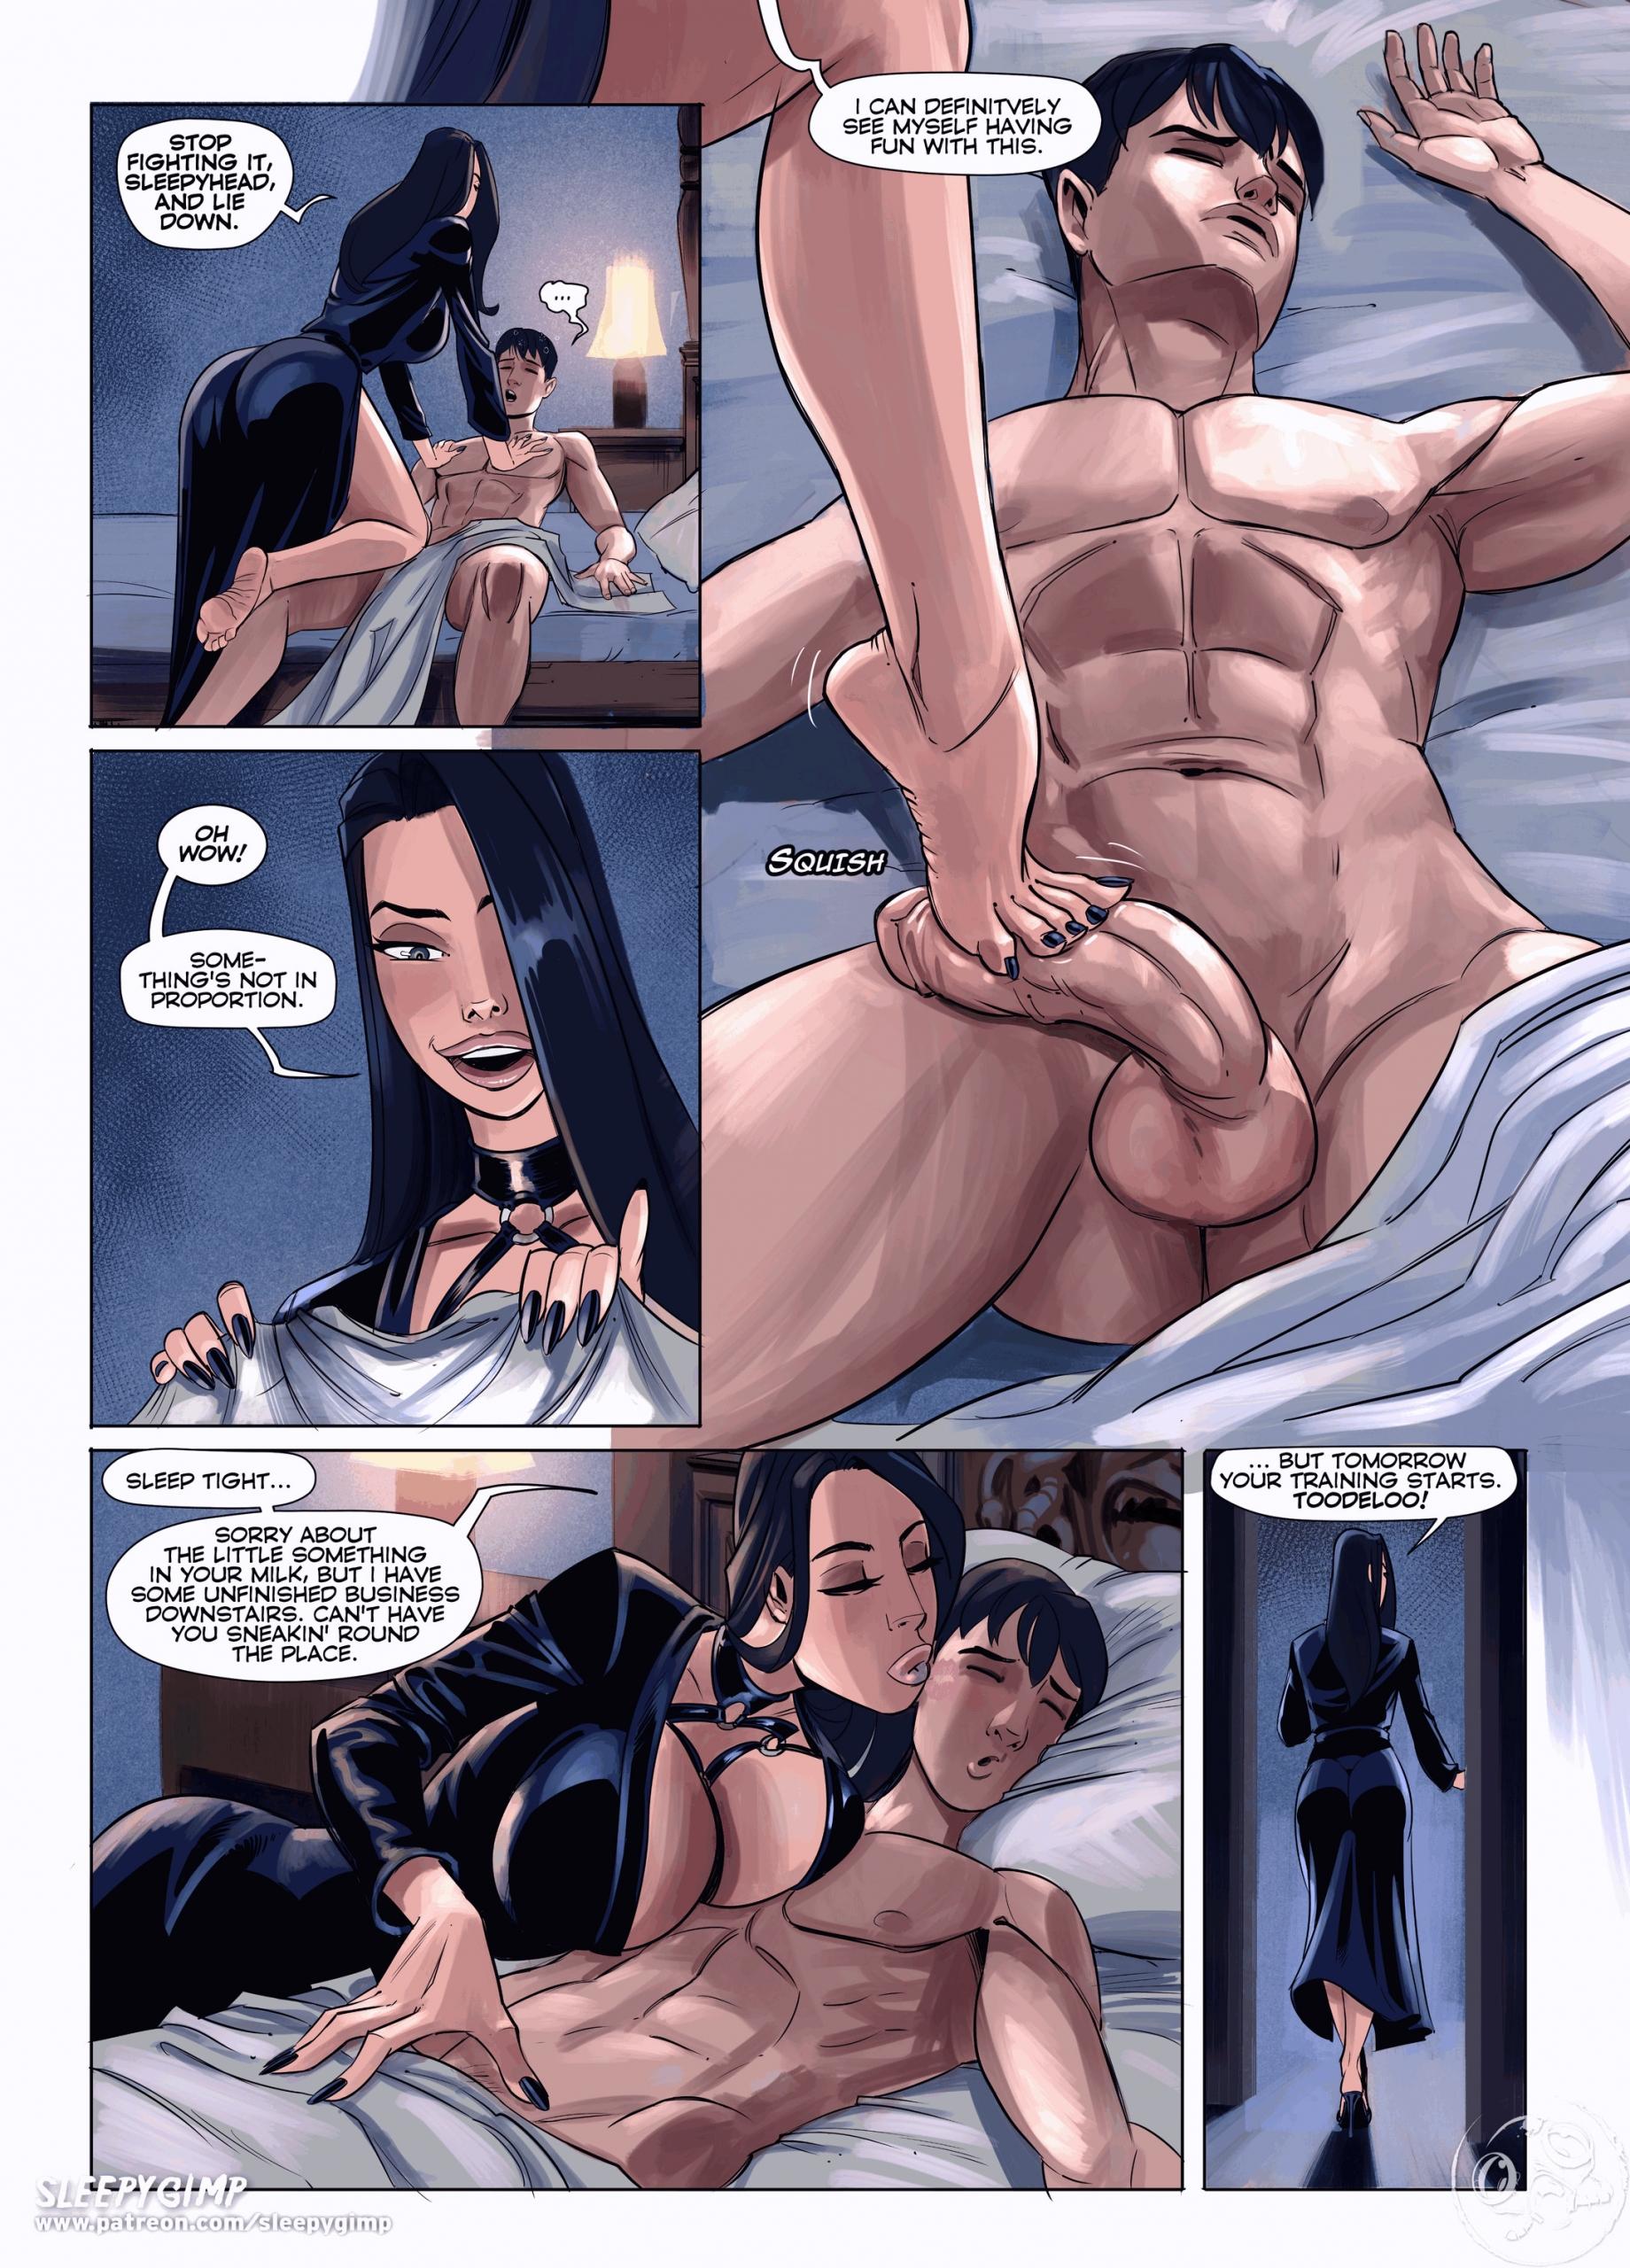 SleepyGimp porn comic page 00011